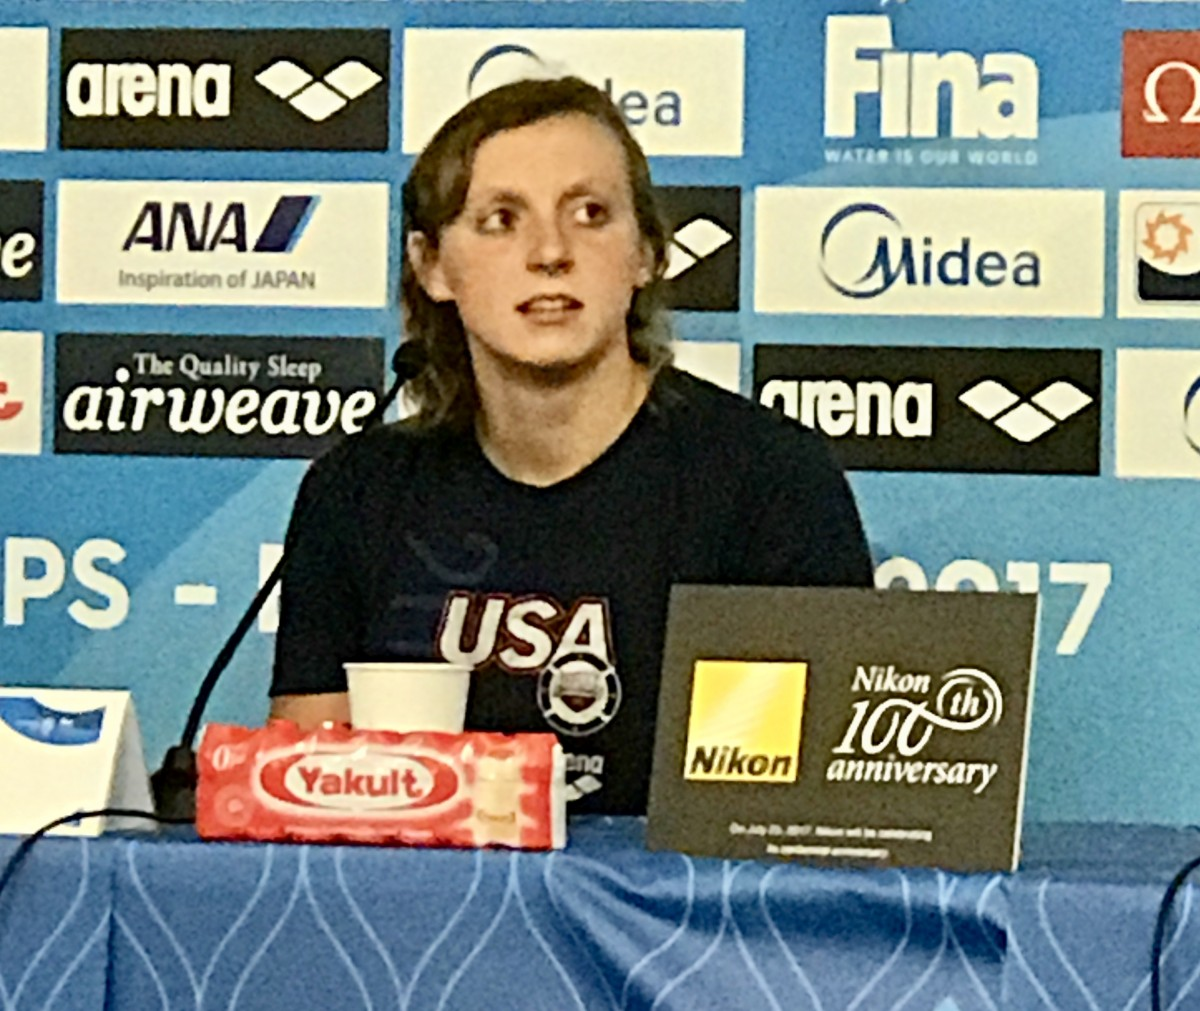 Nuoto - 2018 TYR Pro Swim Series Santa Clara: 100sl a Manuel e Dressel, doppietta Kalisz